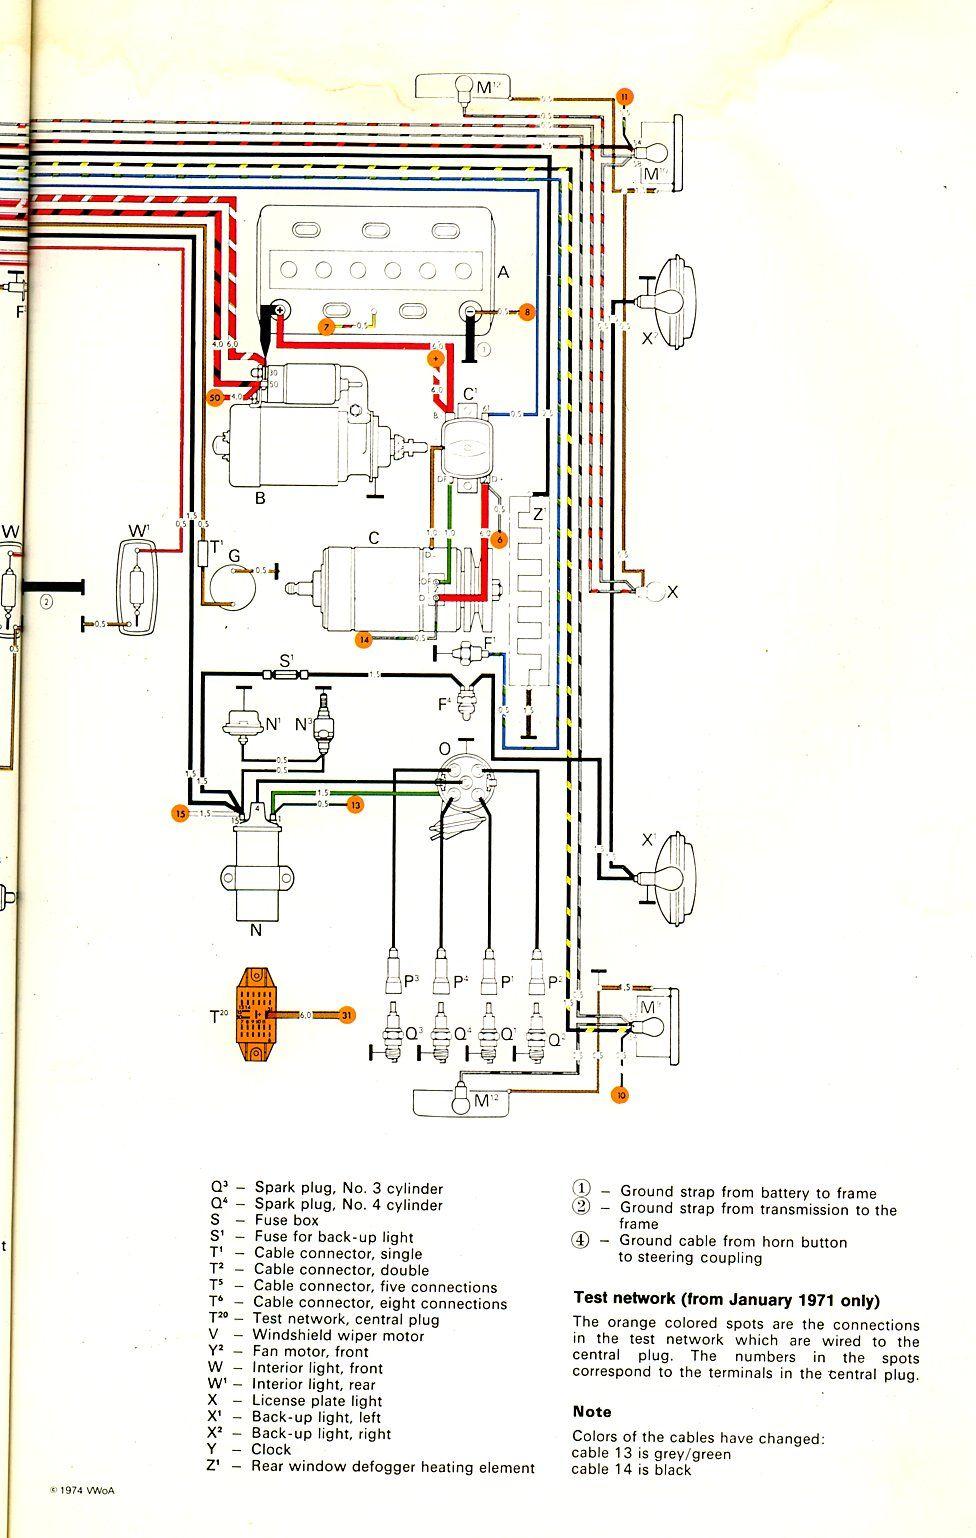 1971 Bus Wiring Diagram Thegoldenbug Com Electrical Wiring Diagram Diagram Bus